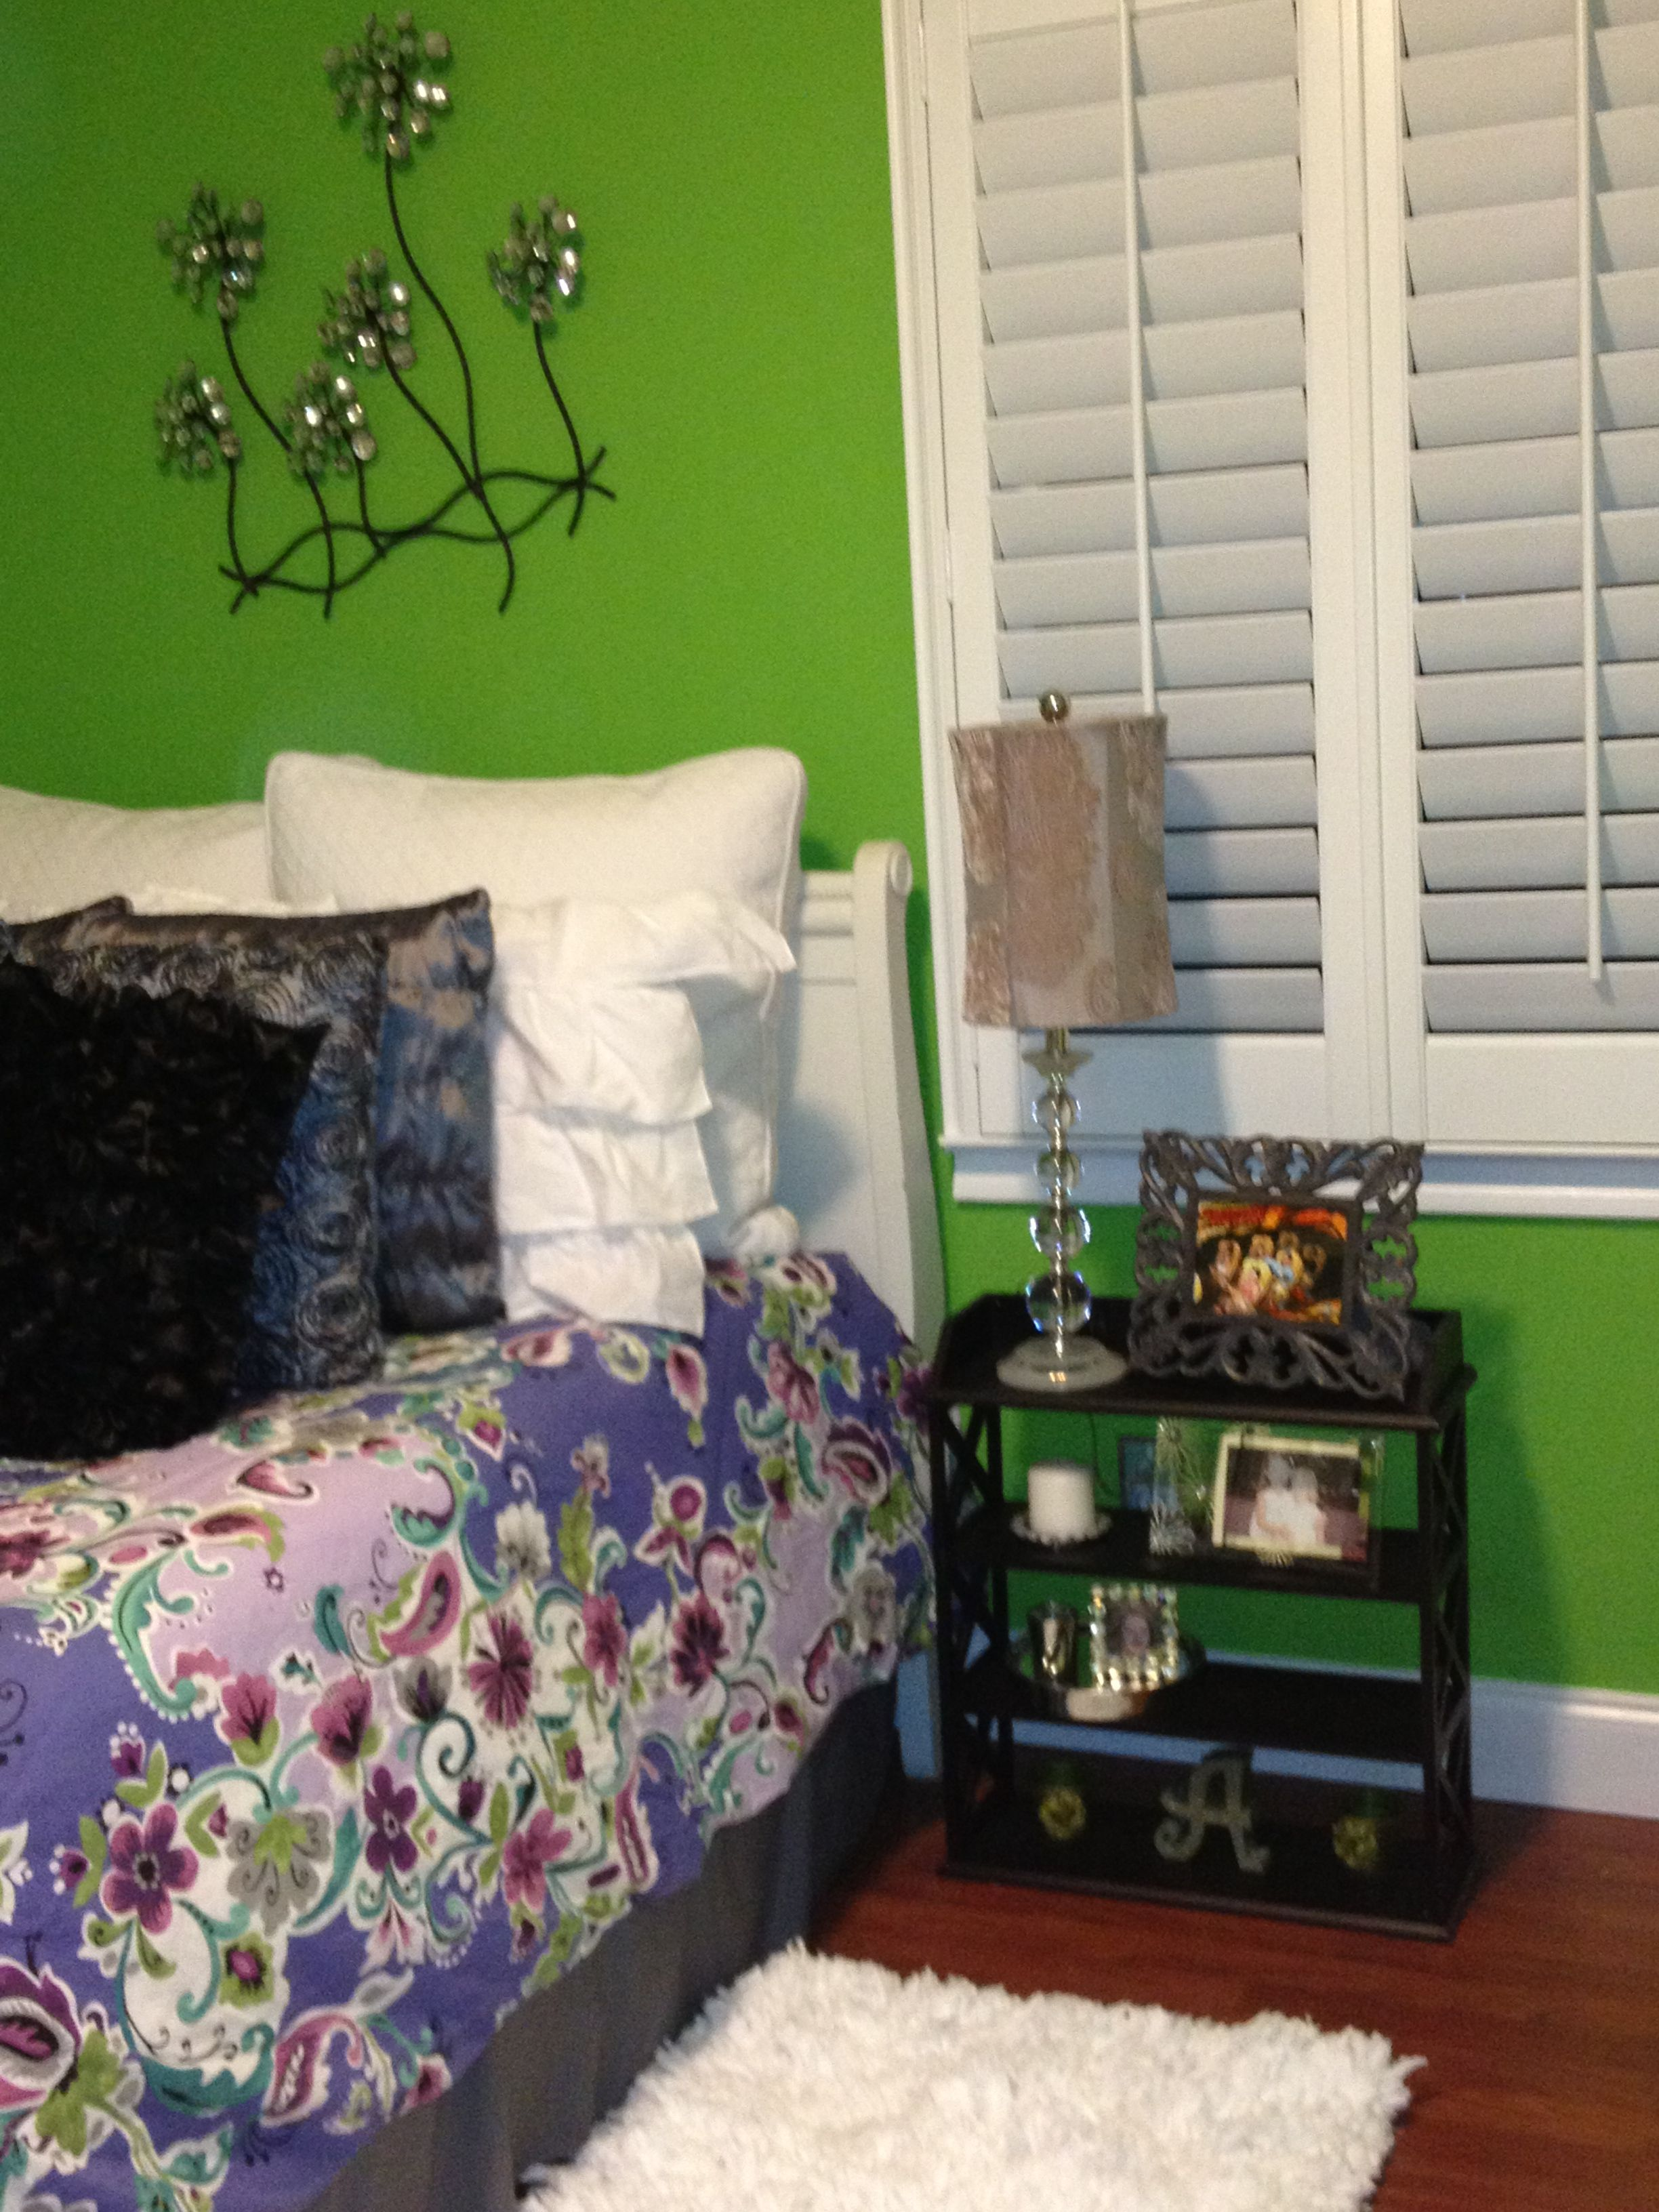 Using a wall shelf as a nightstand